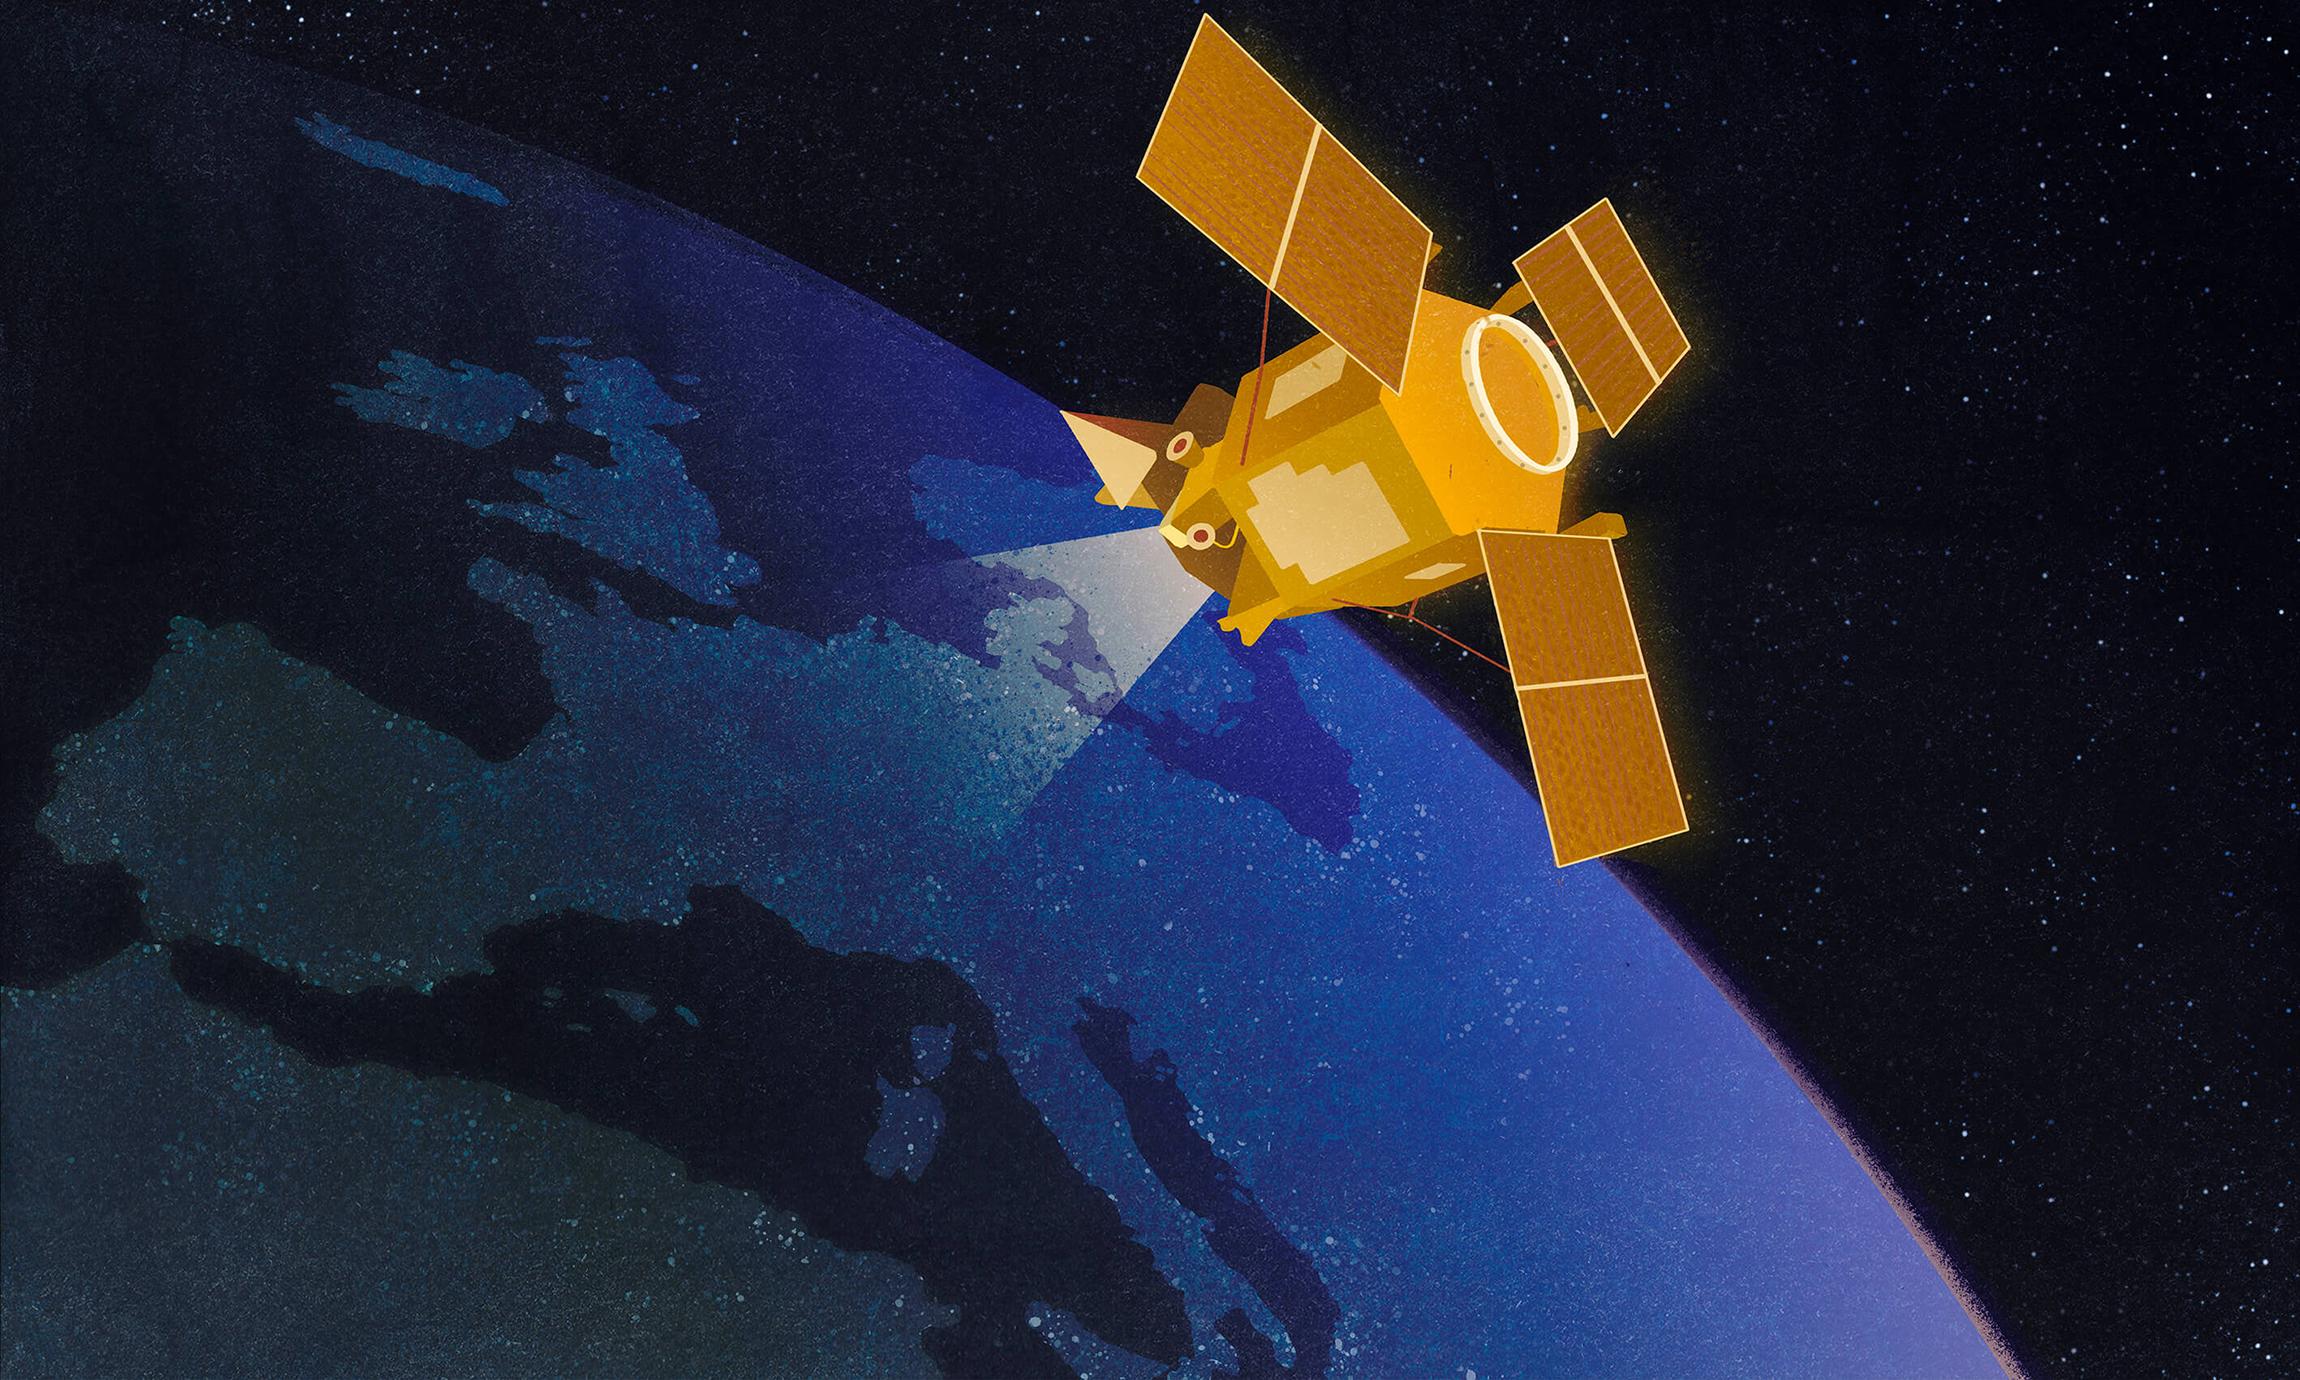 Space_satellite_A